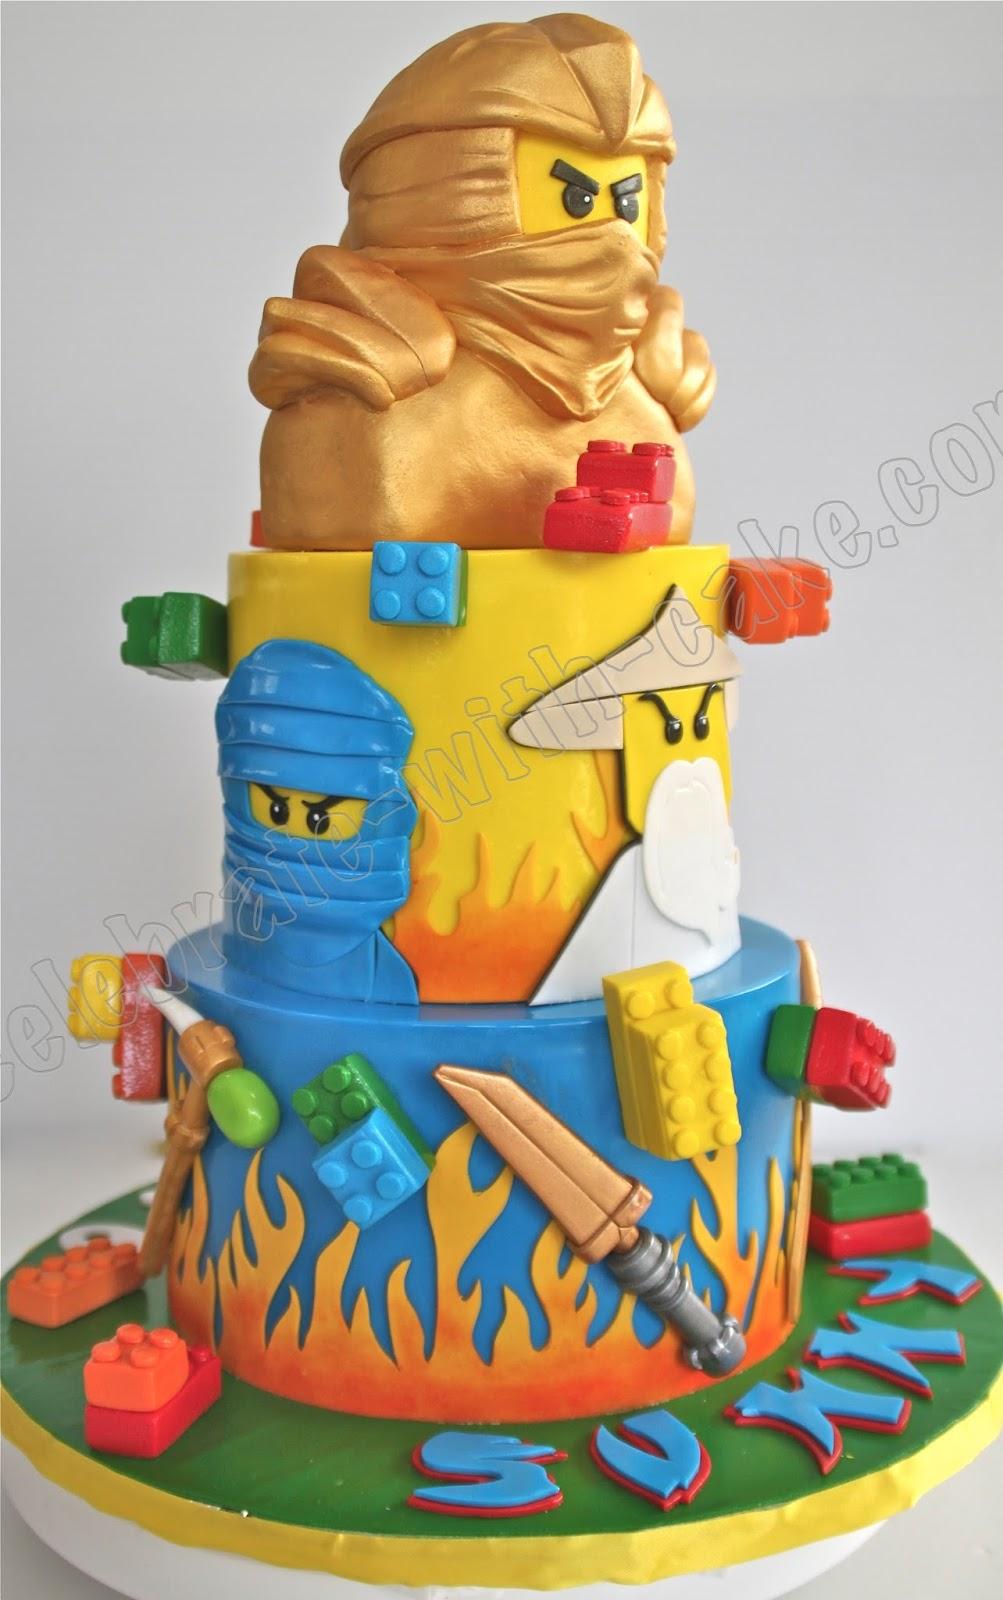 Lego Ninjago 2 Tier Cake